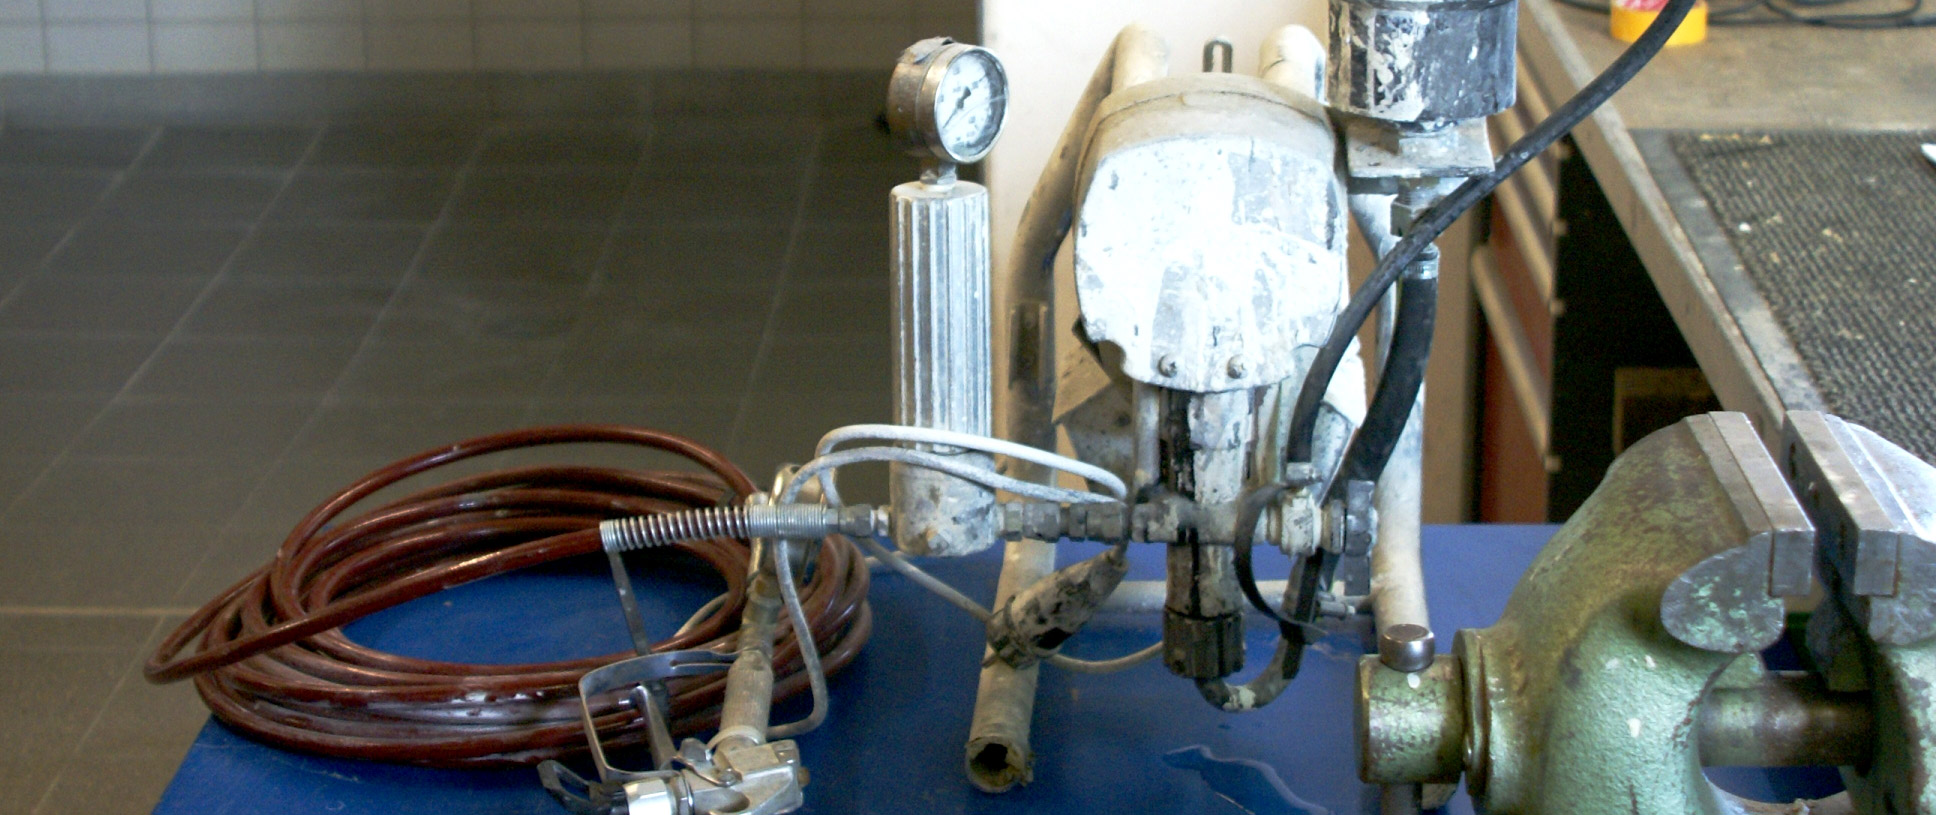 Linz GmbH Reparatur Maschinenklinik